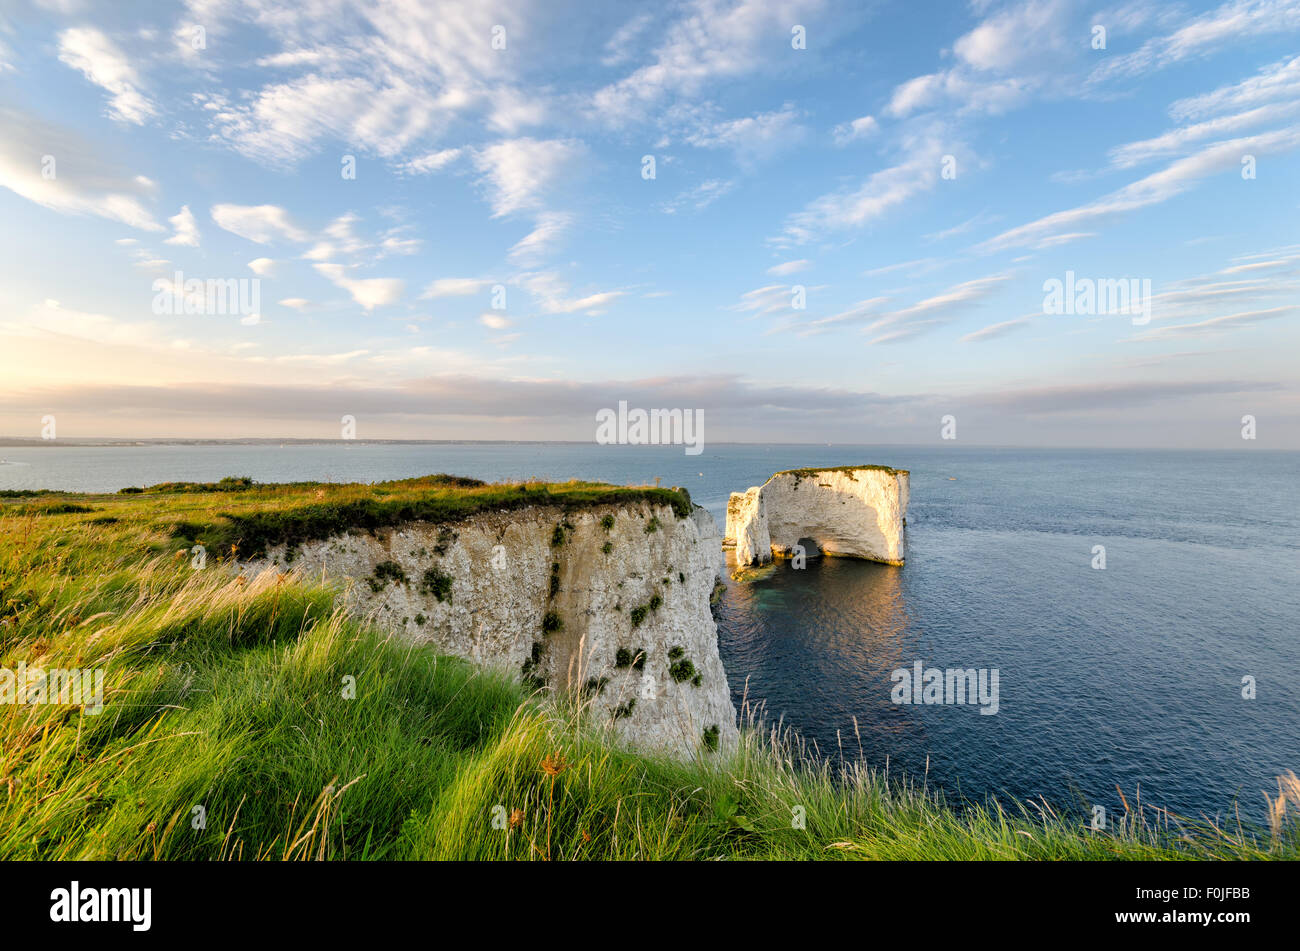 Old Harry Rocks, steep chalk cliffs and sea stacks near Swanage on Dorset's Jurassic Coast Stock Photo